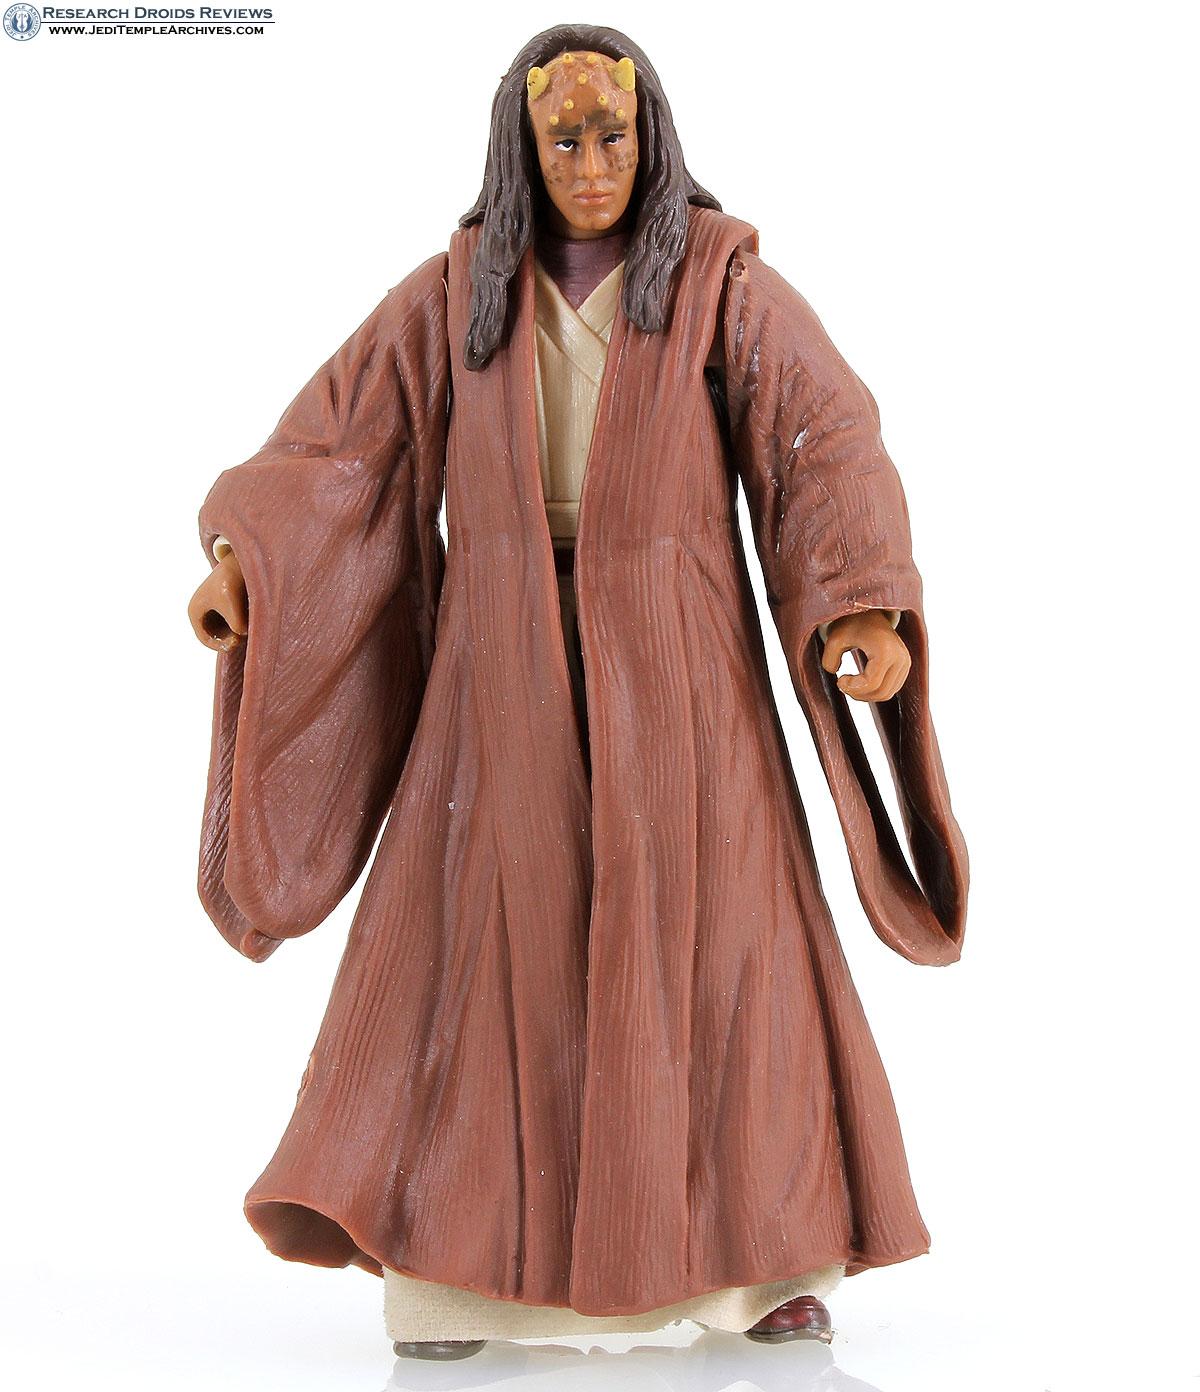 Agen Kolar (Jedi Master)